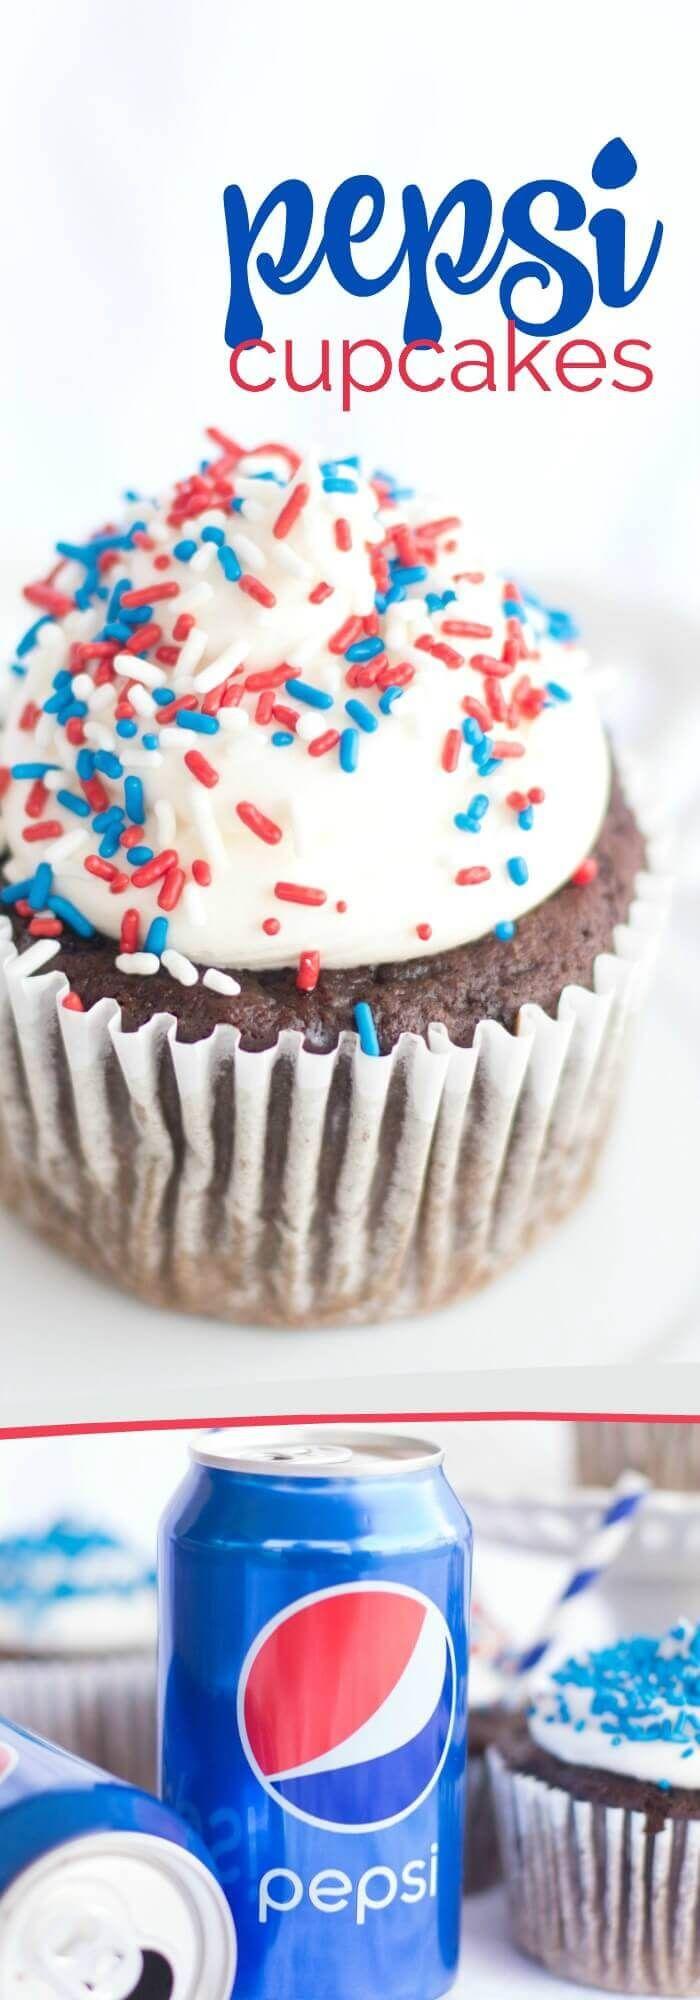 Pepsi Cupcakes